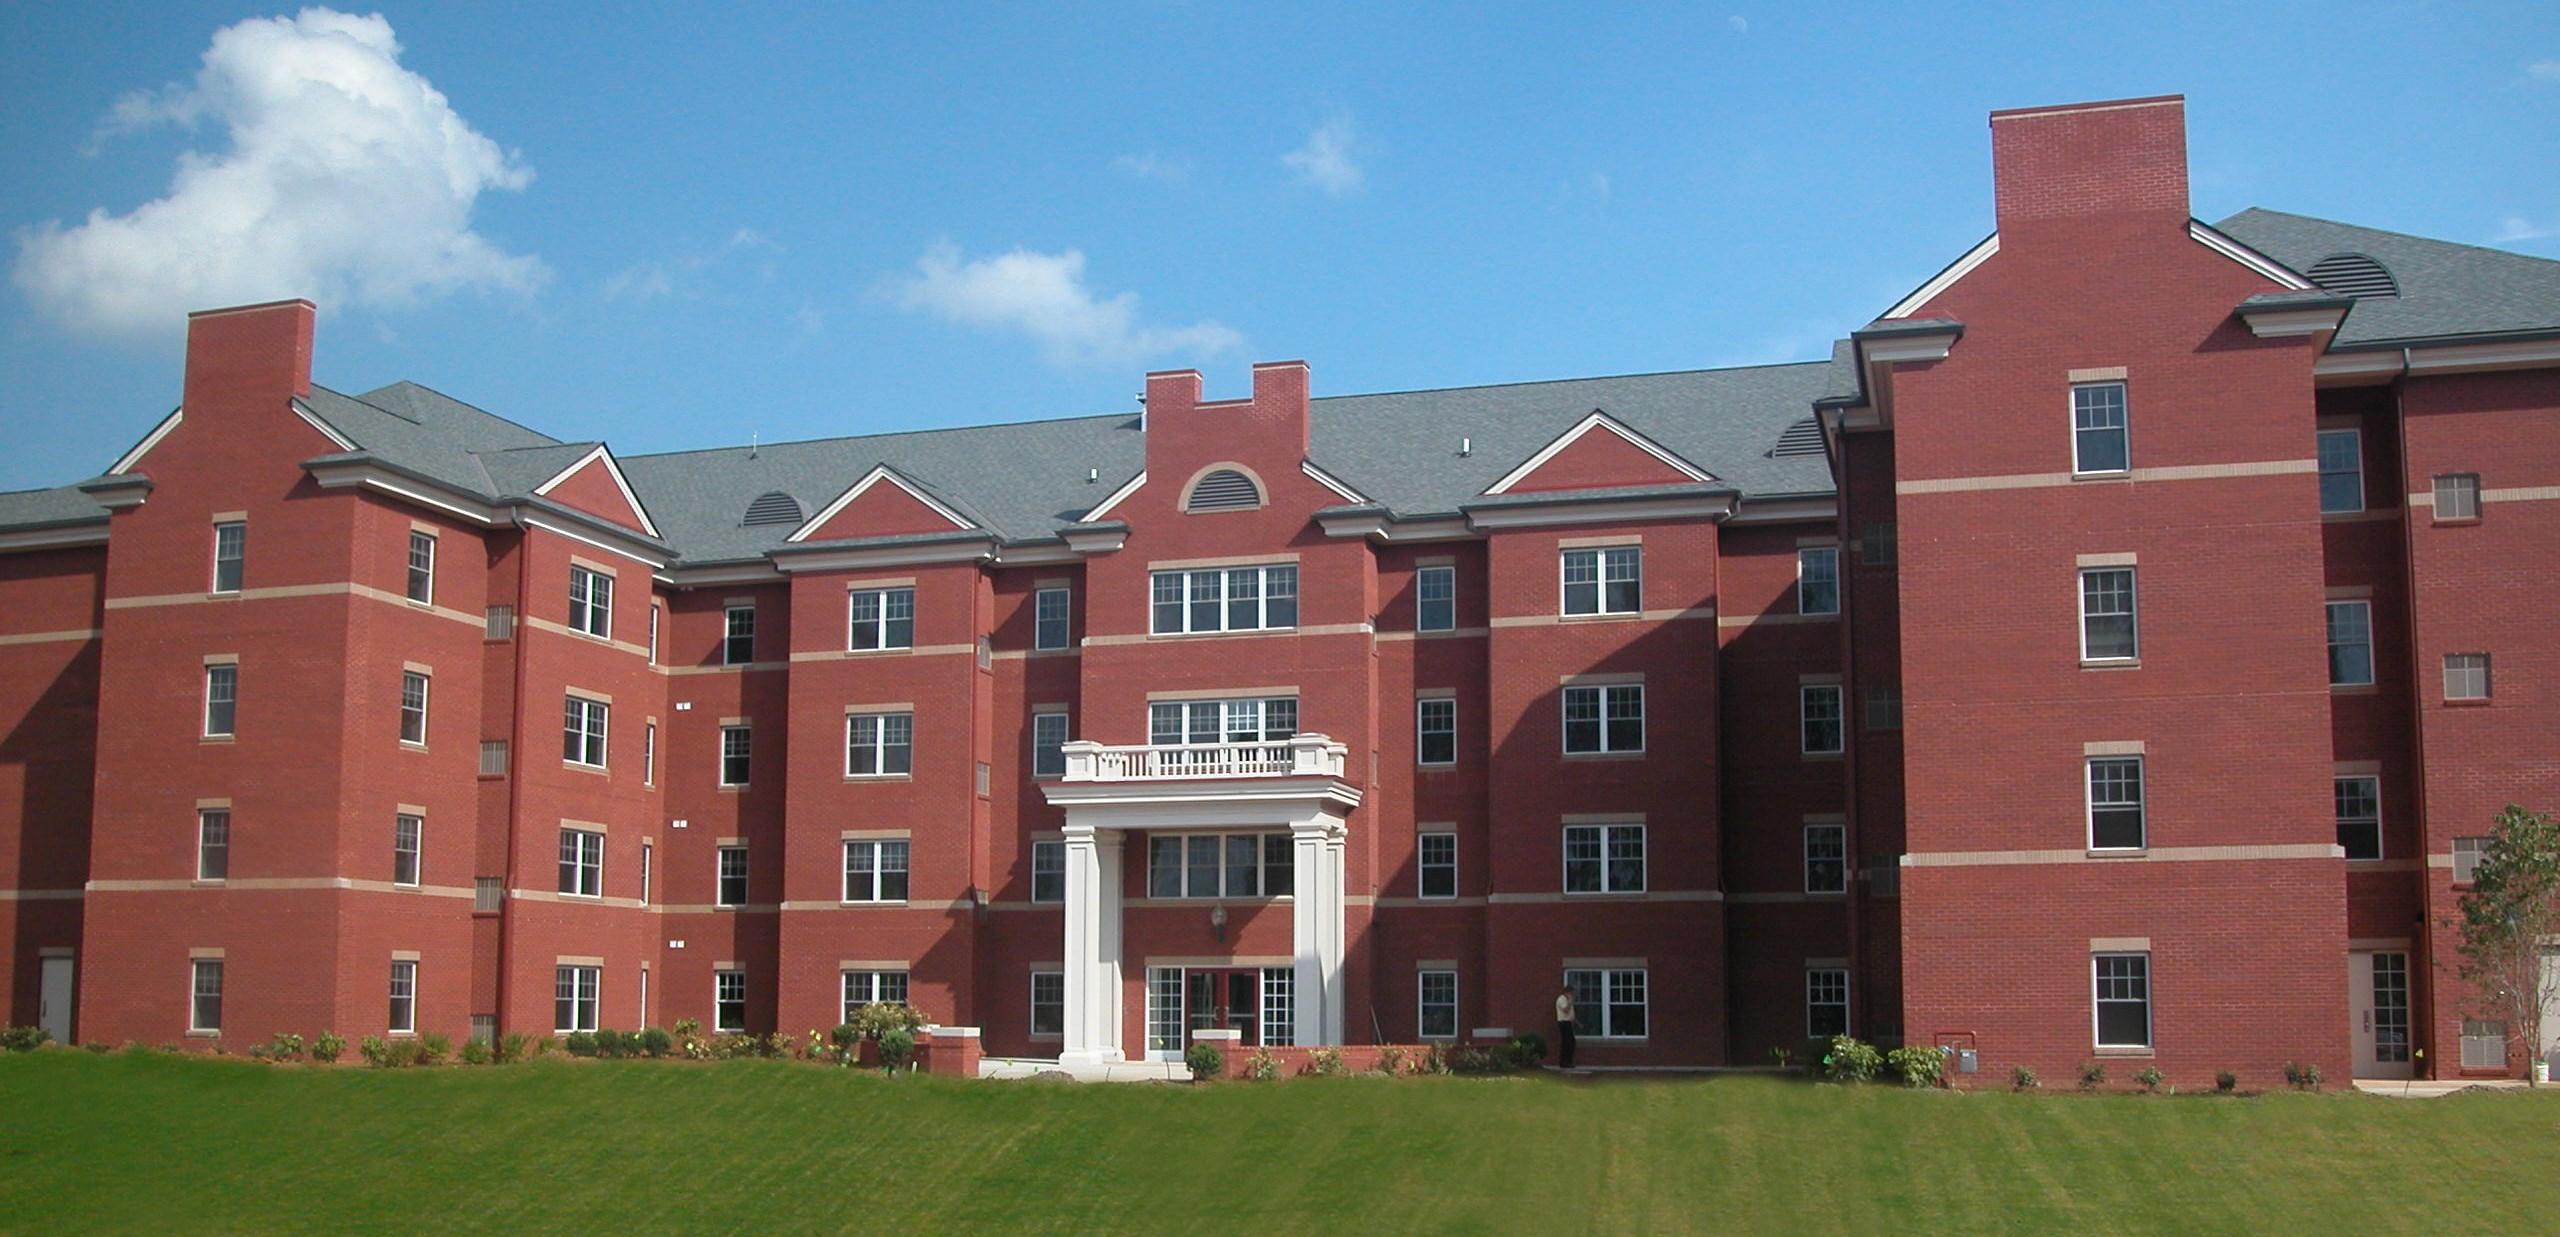 Maryville College Courtyard Filled In 8 8 03 Tellico Village